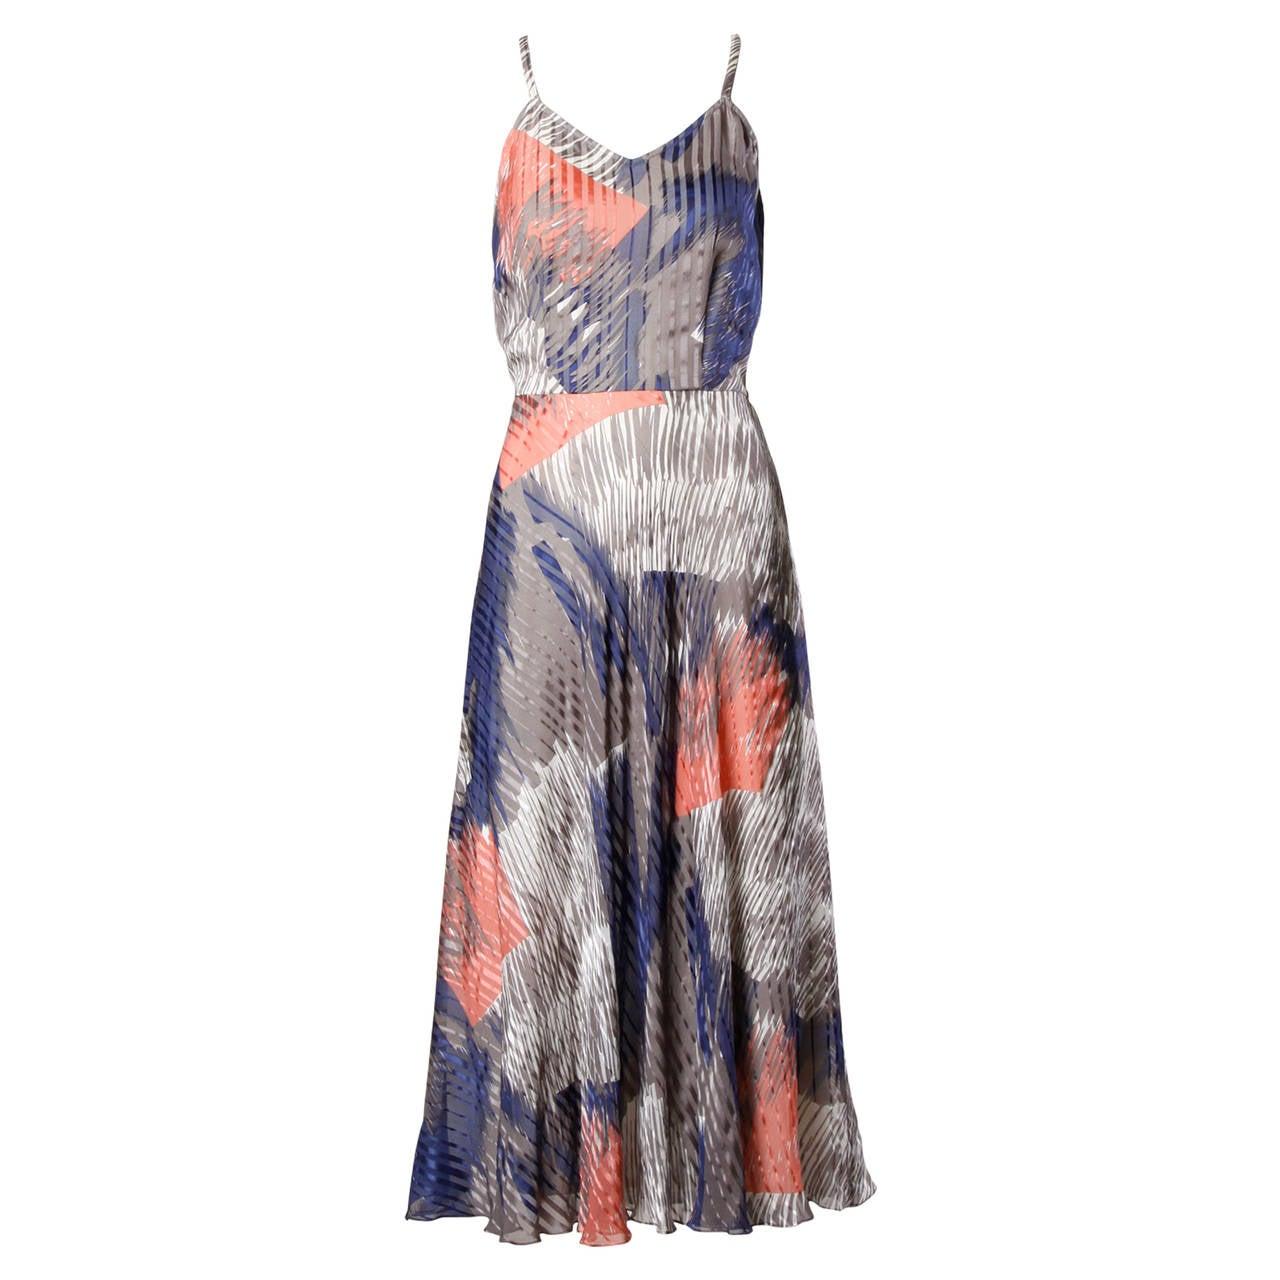 Vintage Sheer Printed Silk Chiffon Dress For Sale